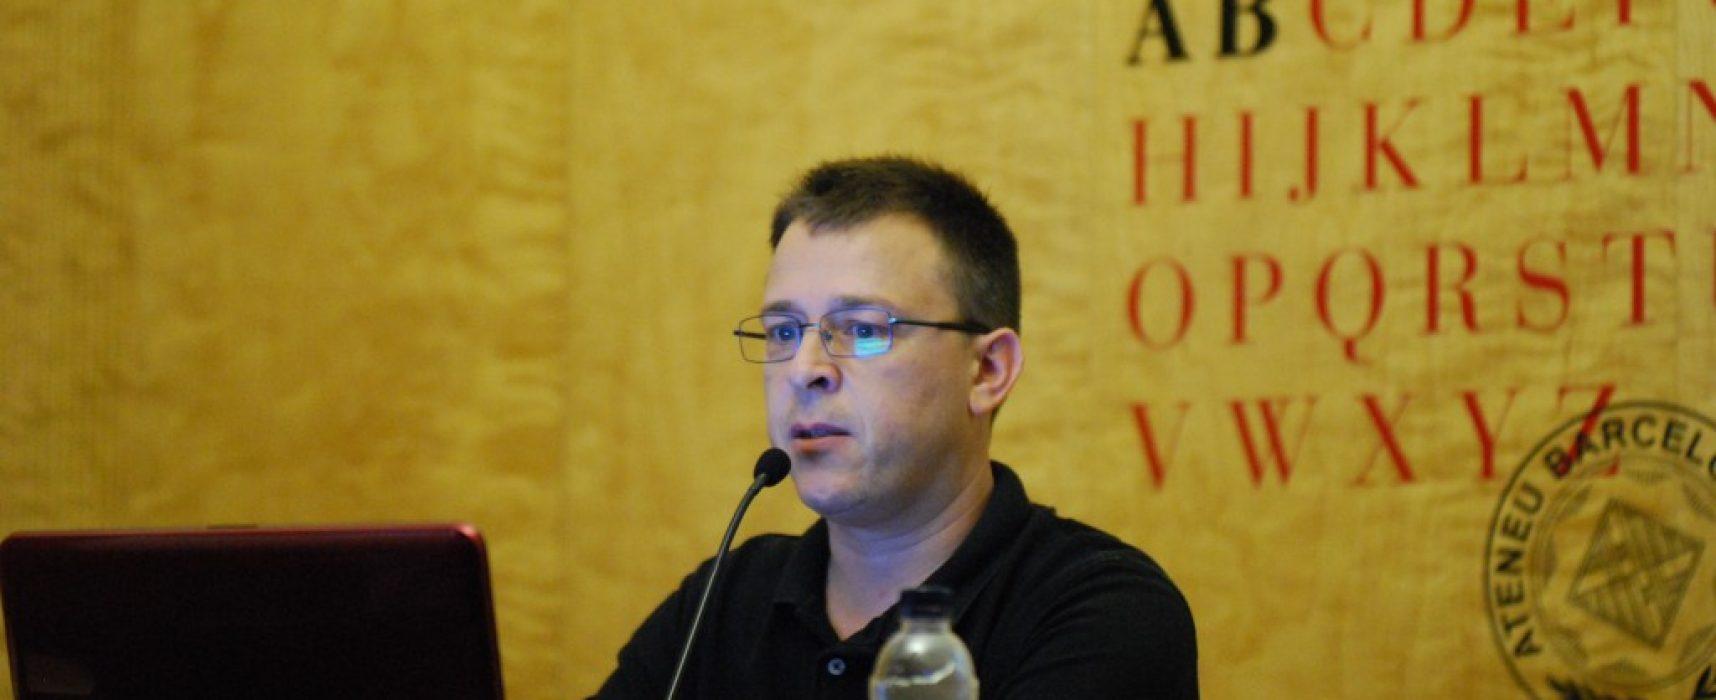 Michael Rahal en La Térmica: Málaga (14 FEB) y Nerja (15 FEB).